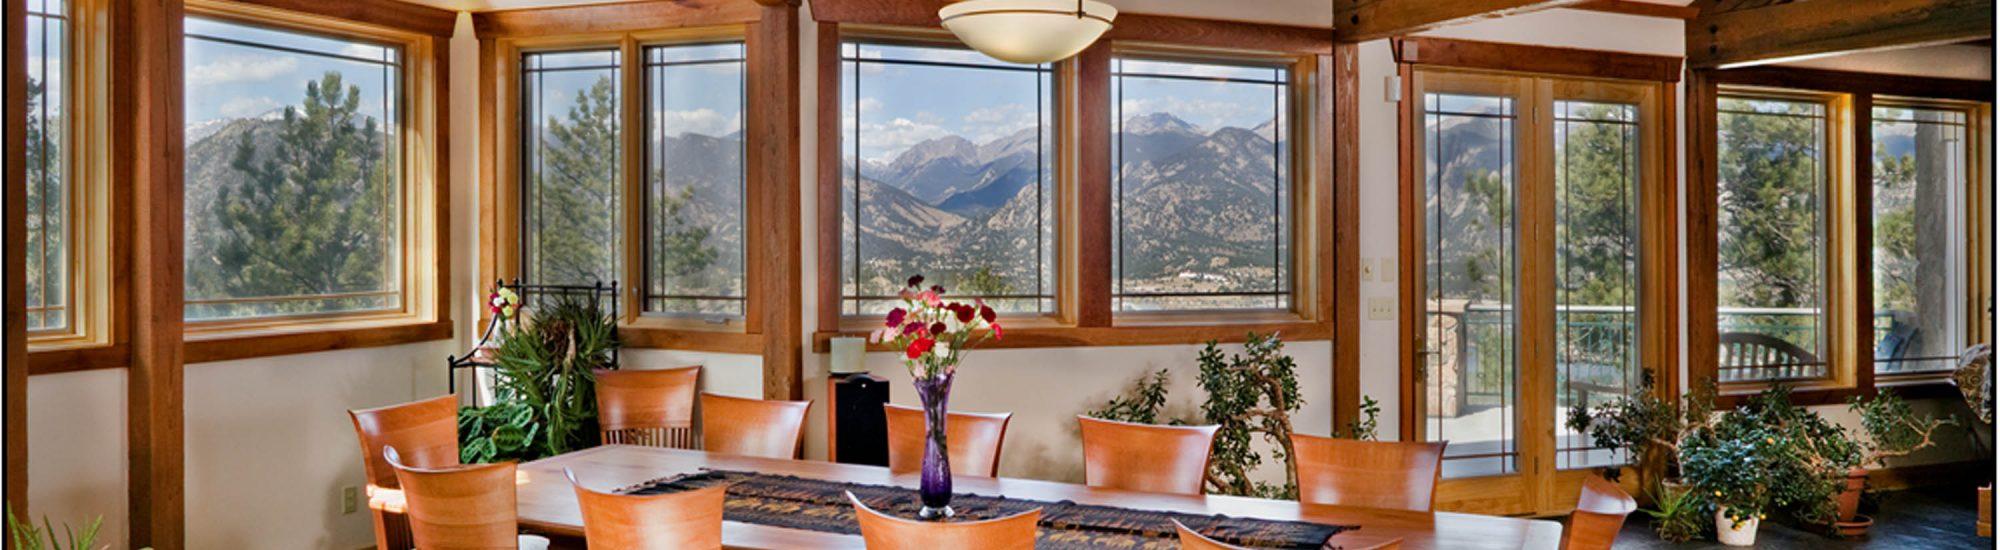 DePrez-Beck Off-Grid Residence dining room